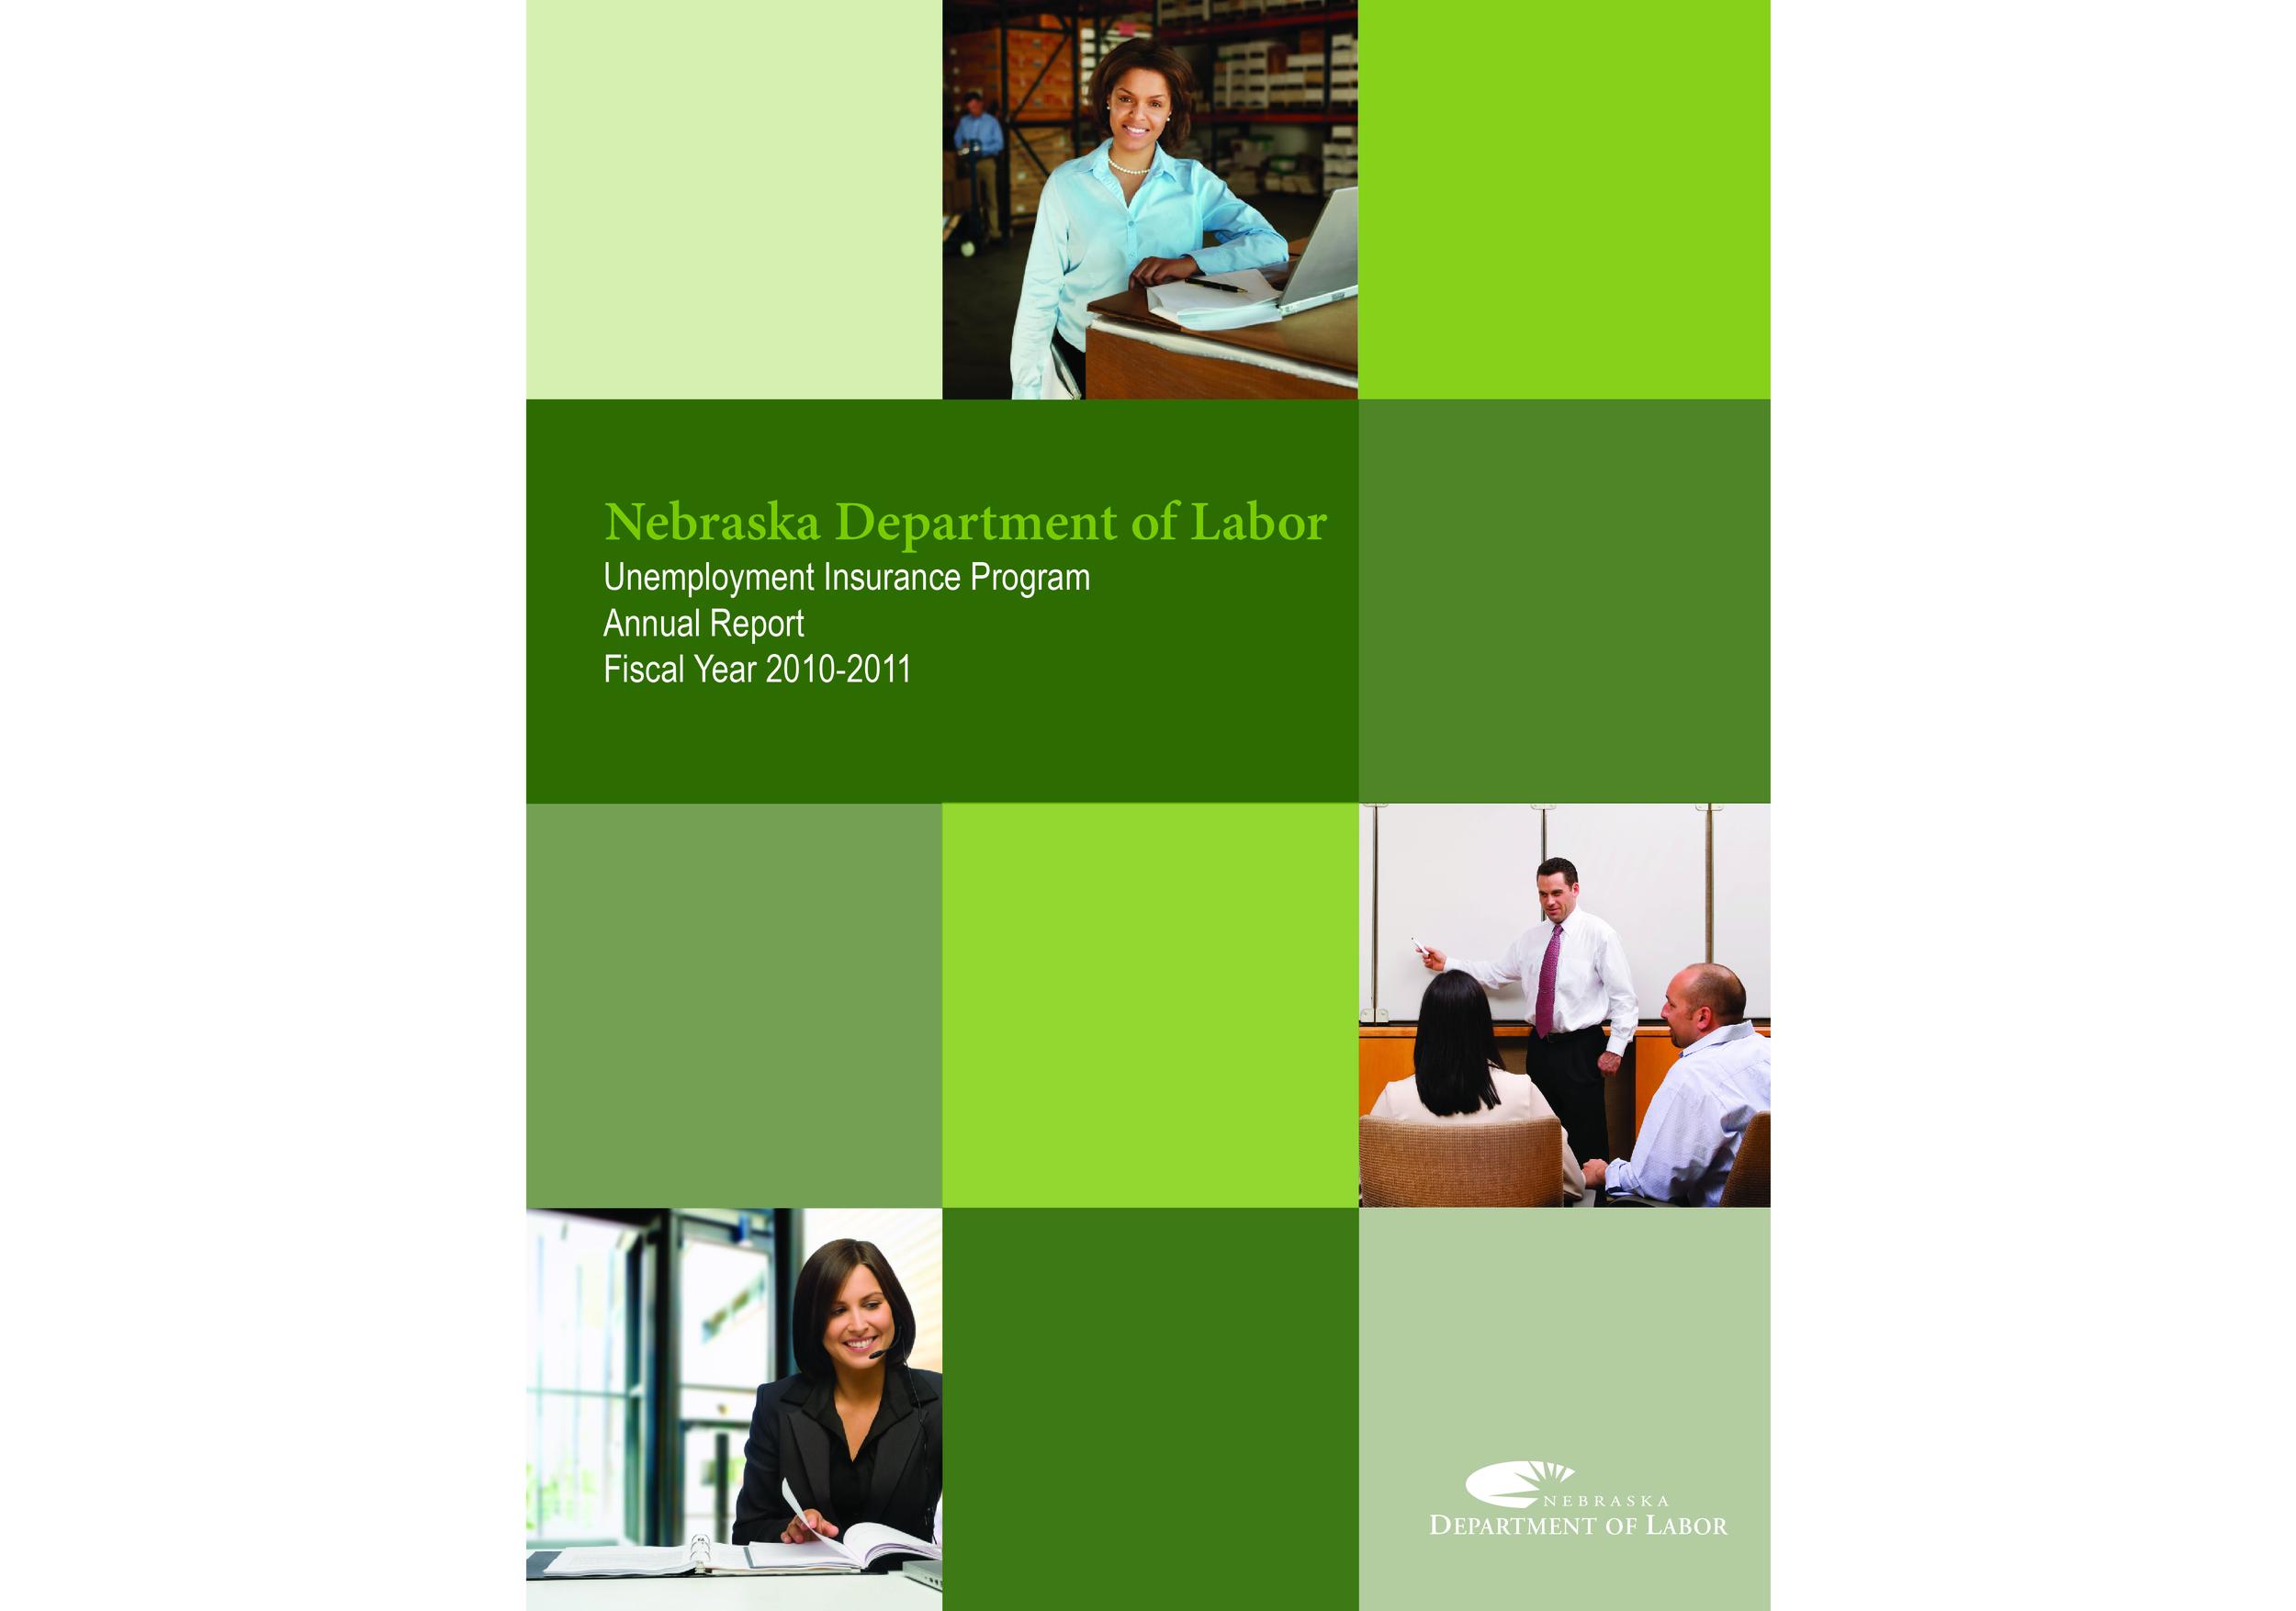 Unemployment Insurance Program Annual Report | 2011